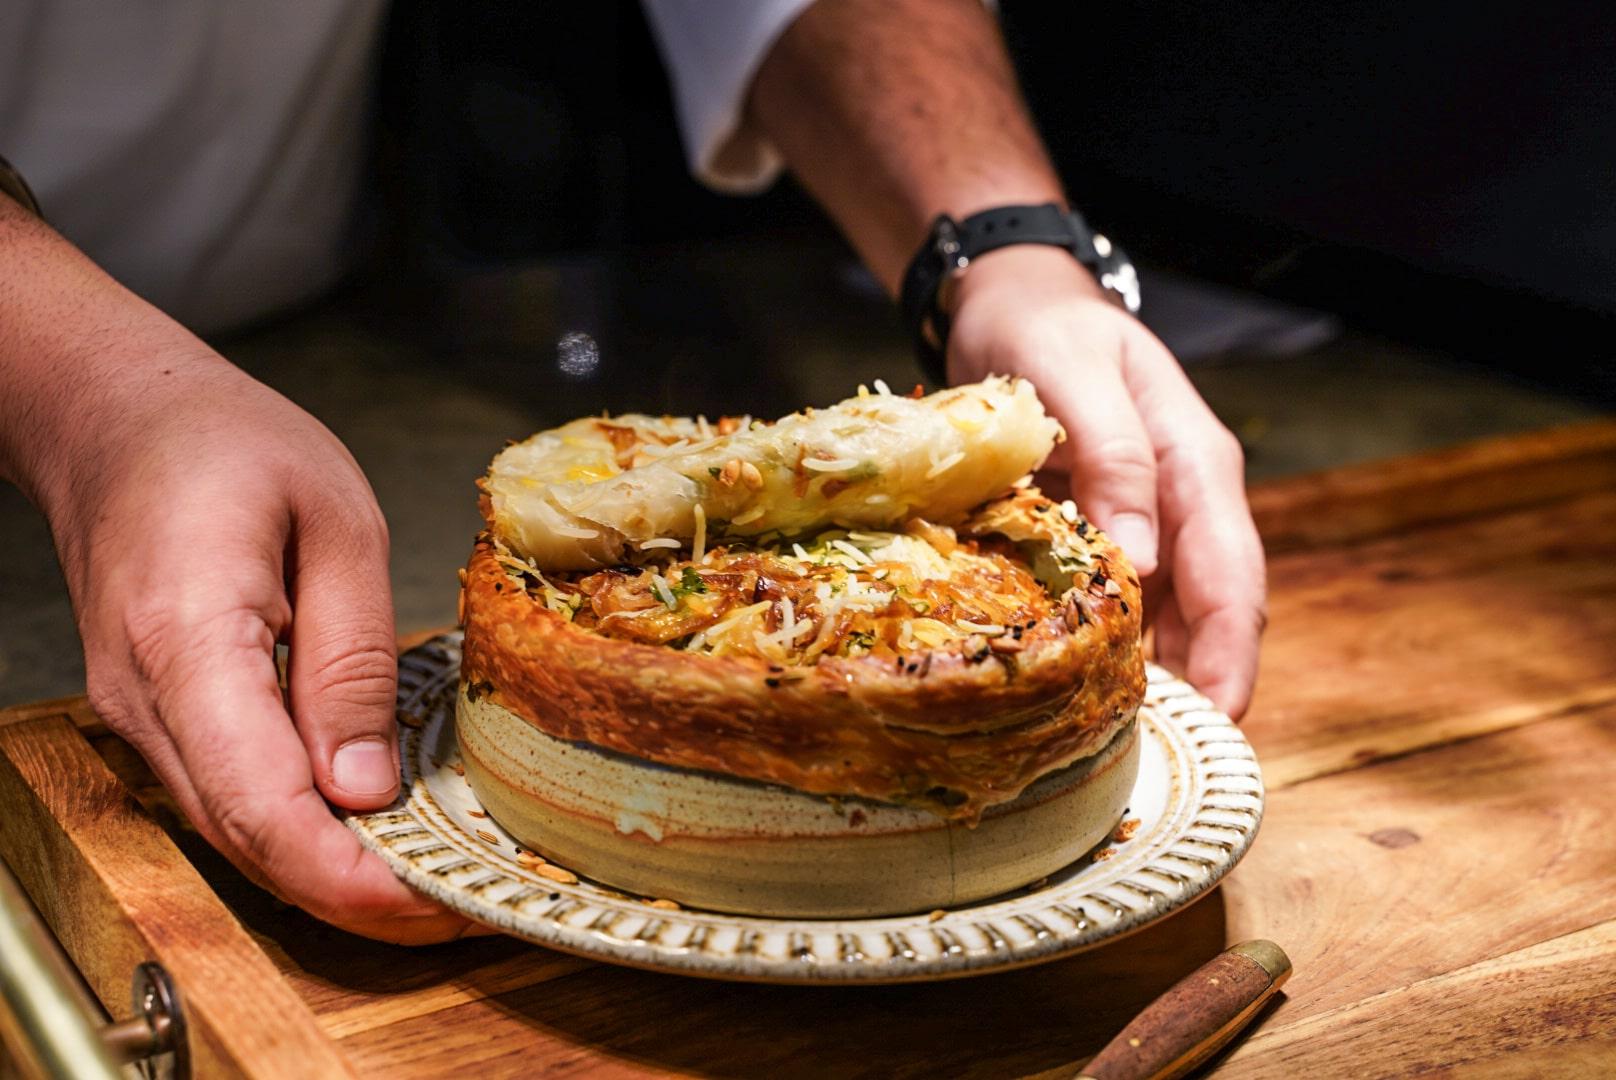 Chaat 的羊肉 biryani 利用洋蔥、番茄和乳酪令米飯得以保留水份。(相片:Pearl Yan)